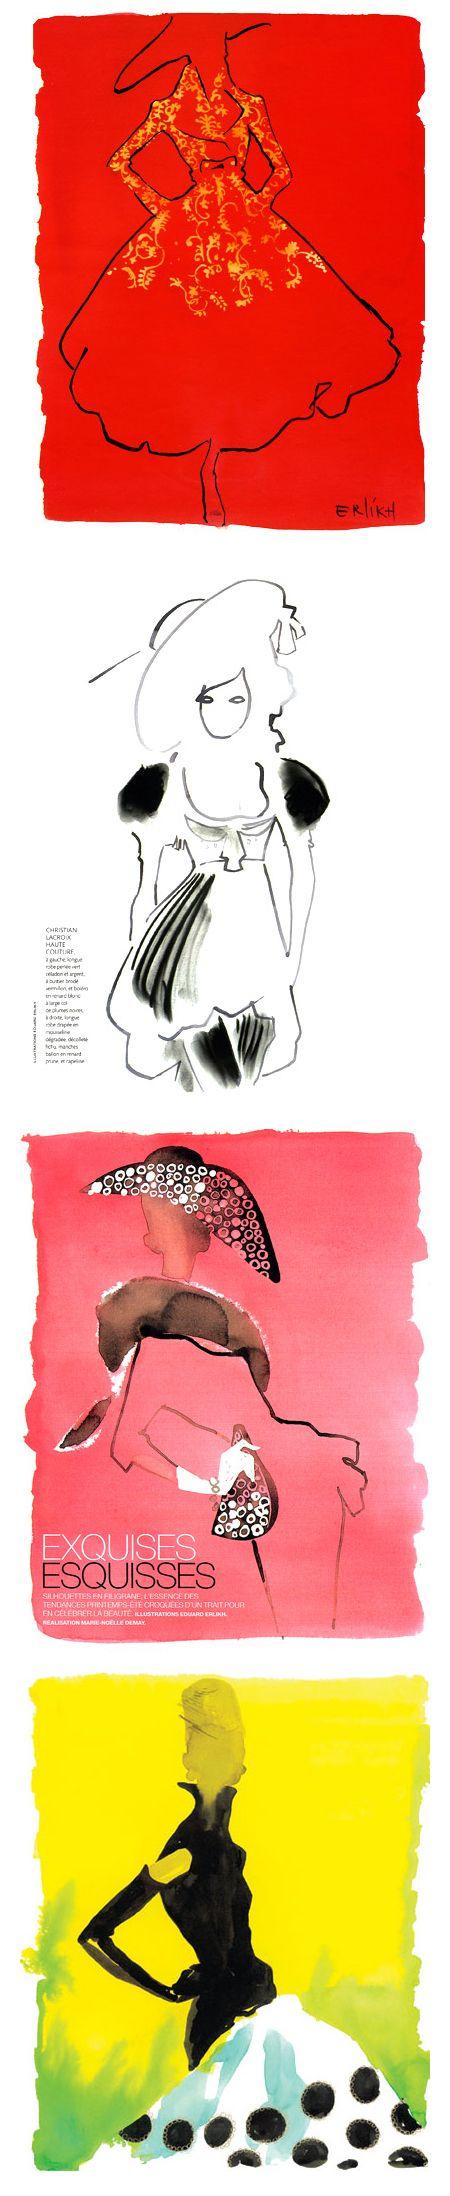 fashion illustrator Eduard Erlikh